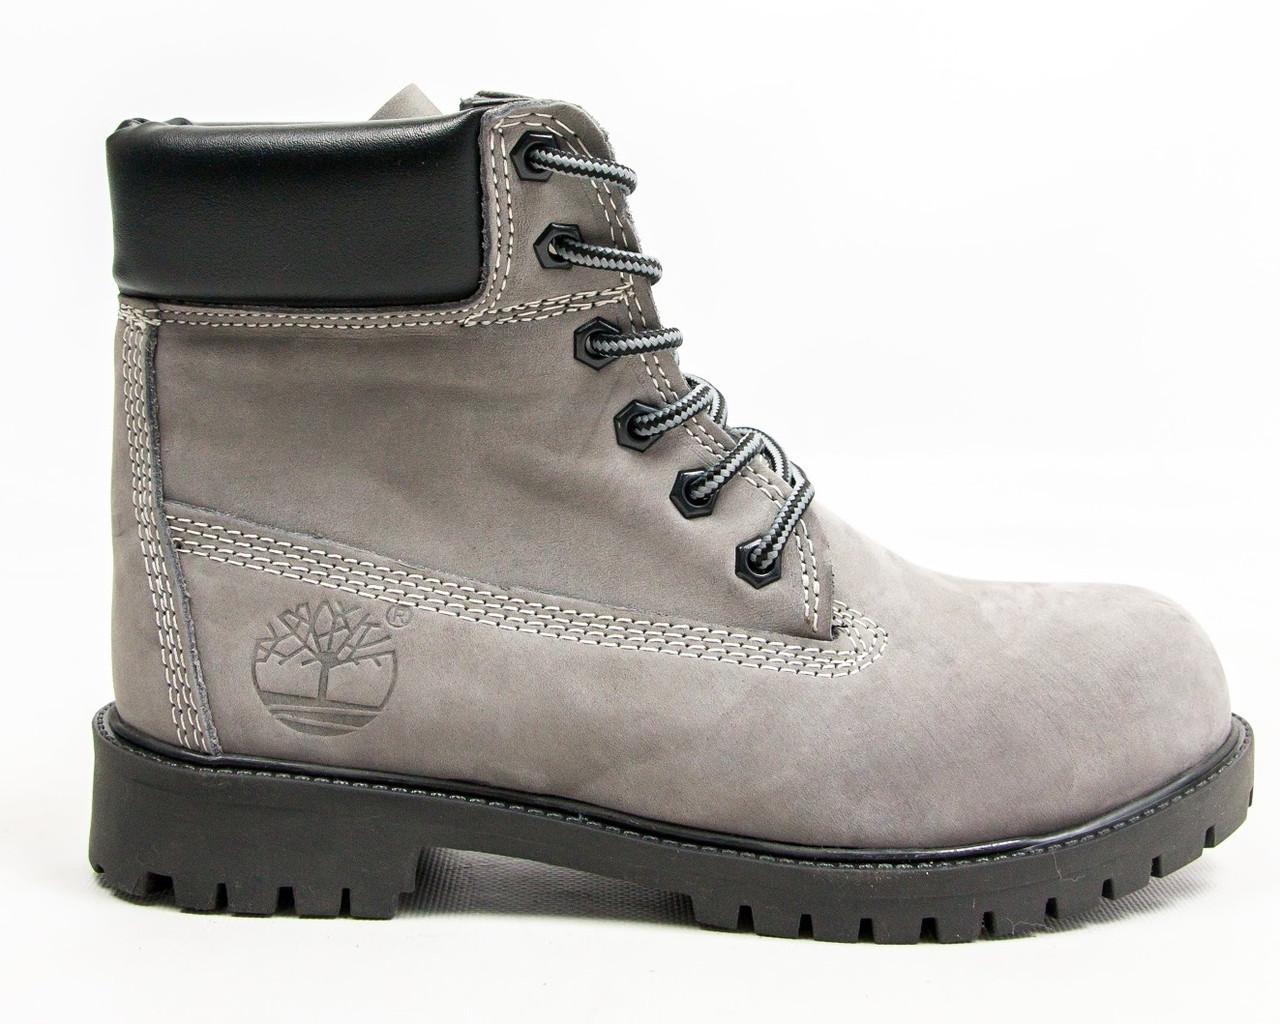 Зимние женские ботинки Timberland 6 inch gray black (Реплика ААА+)